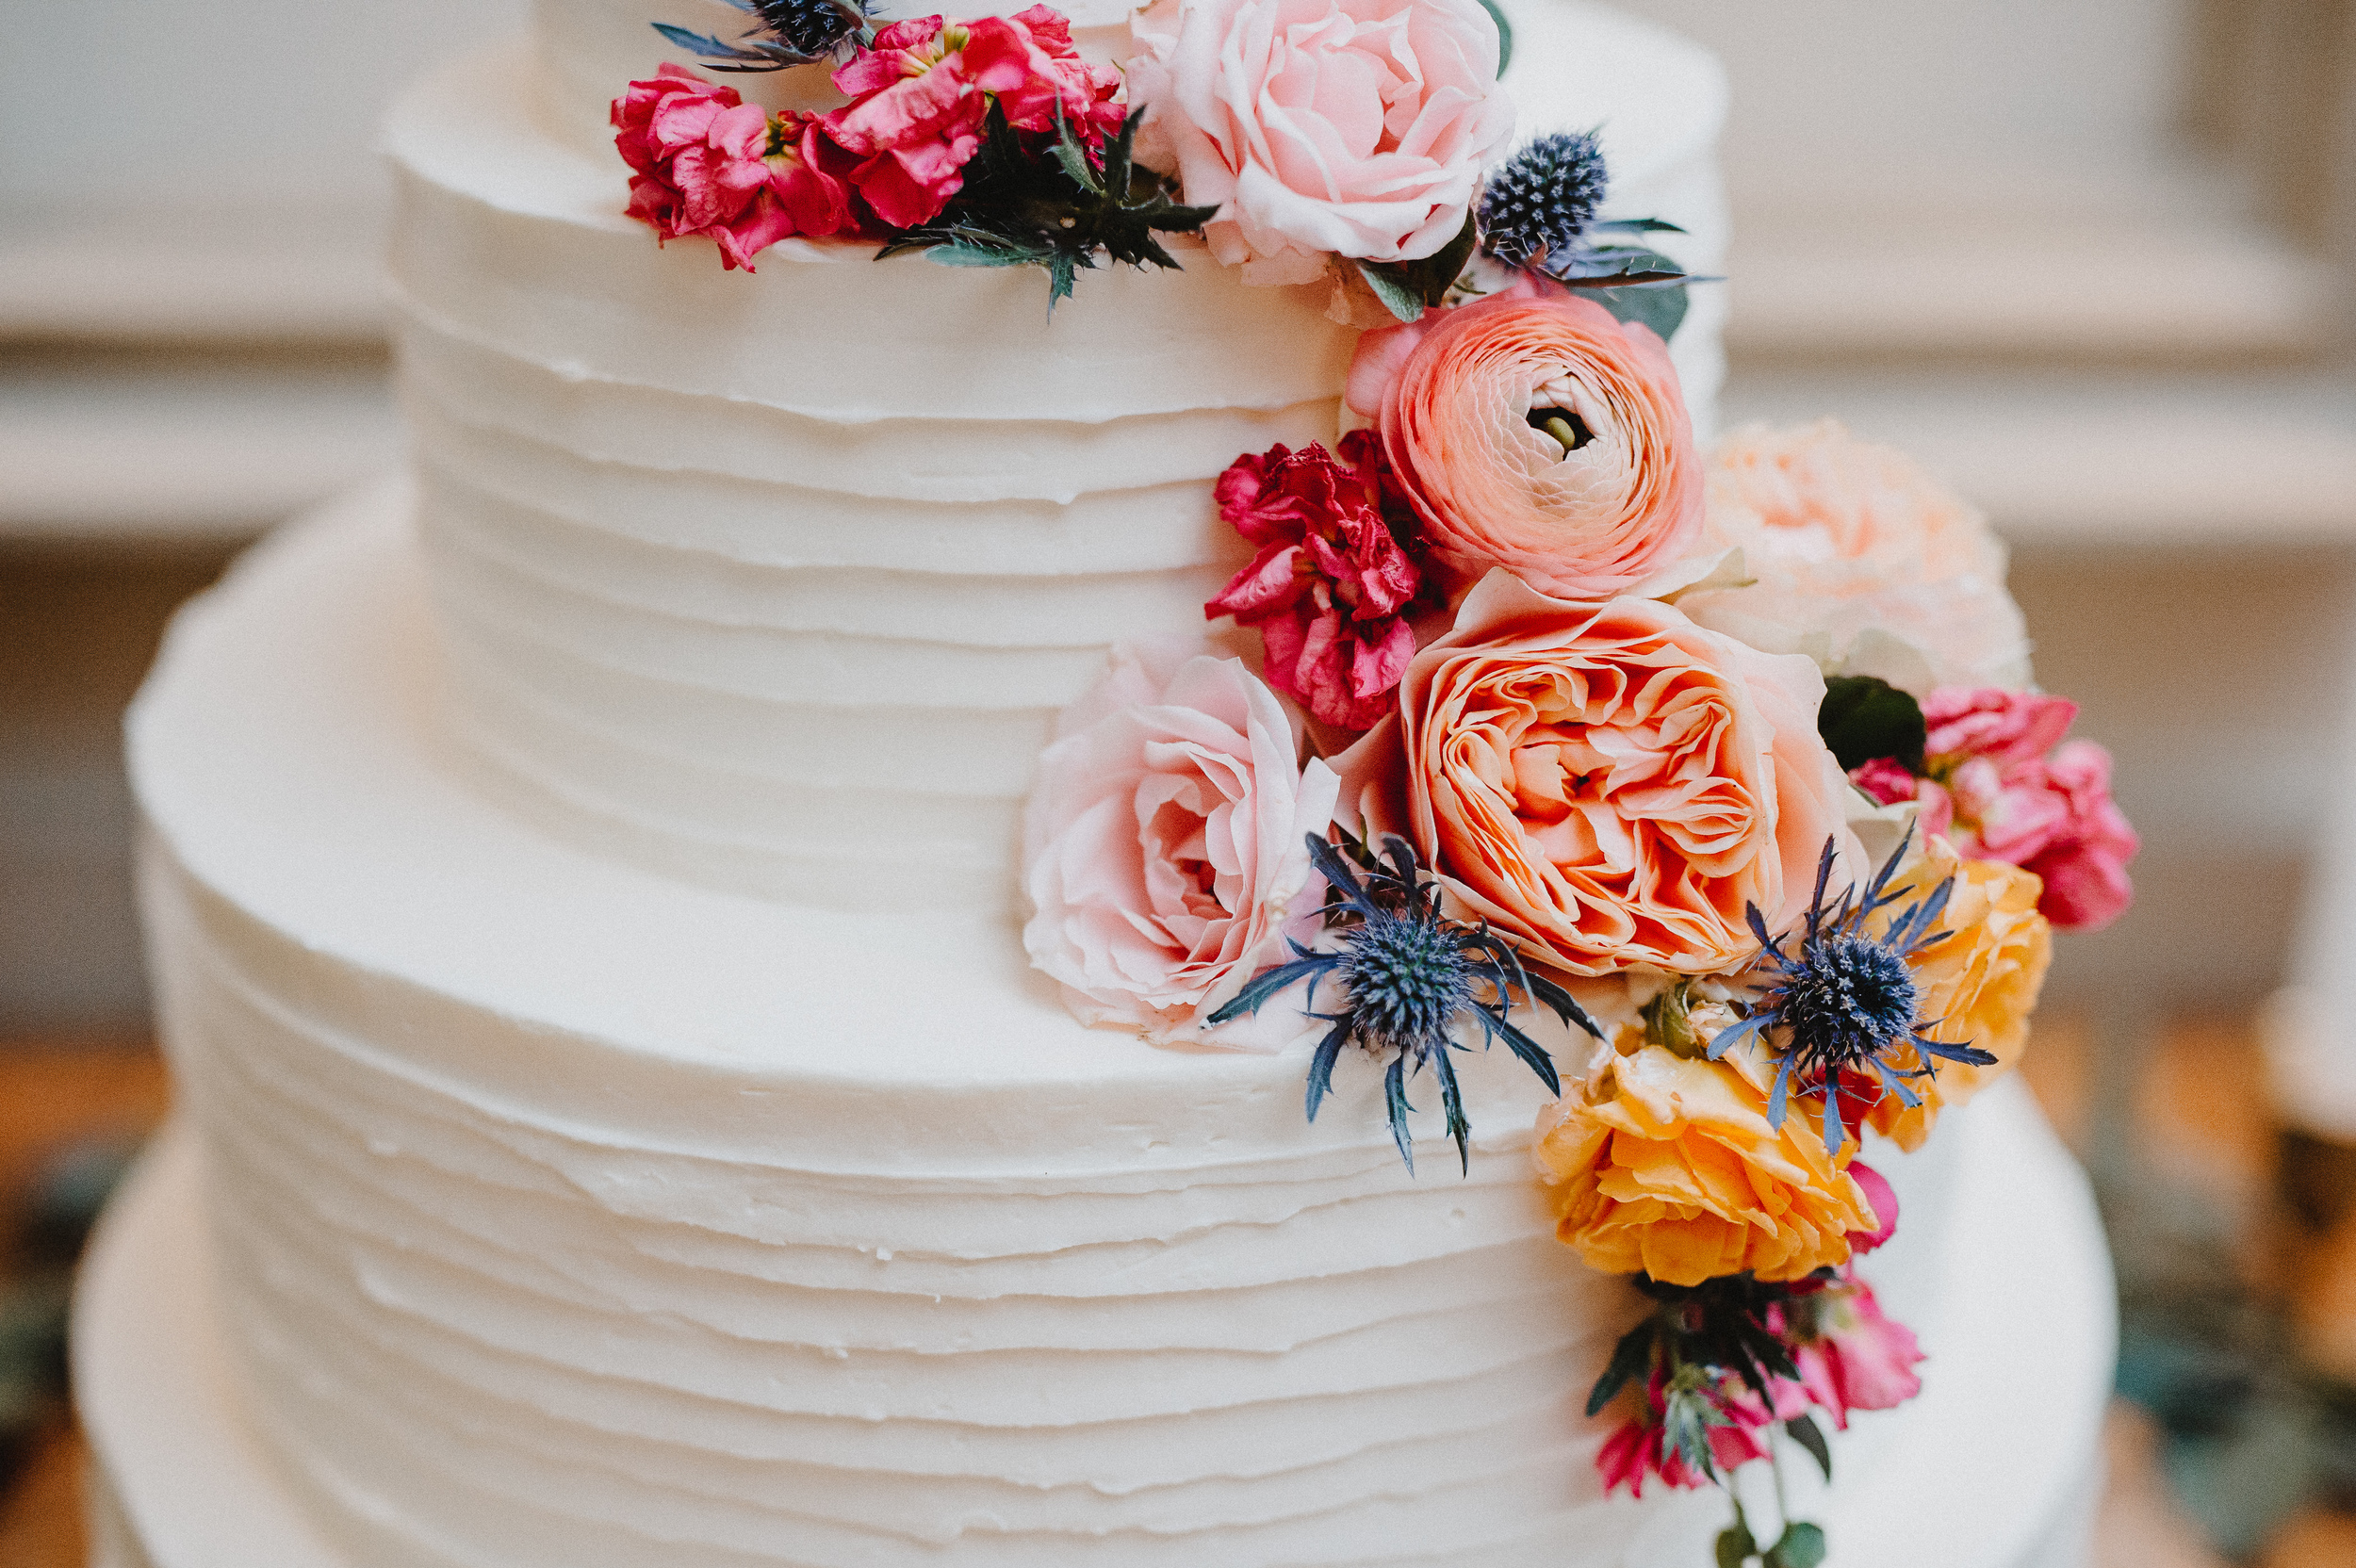 holly-hedge-estate-wedding-photographer-pat-robinson-photography-78.jpg